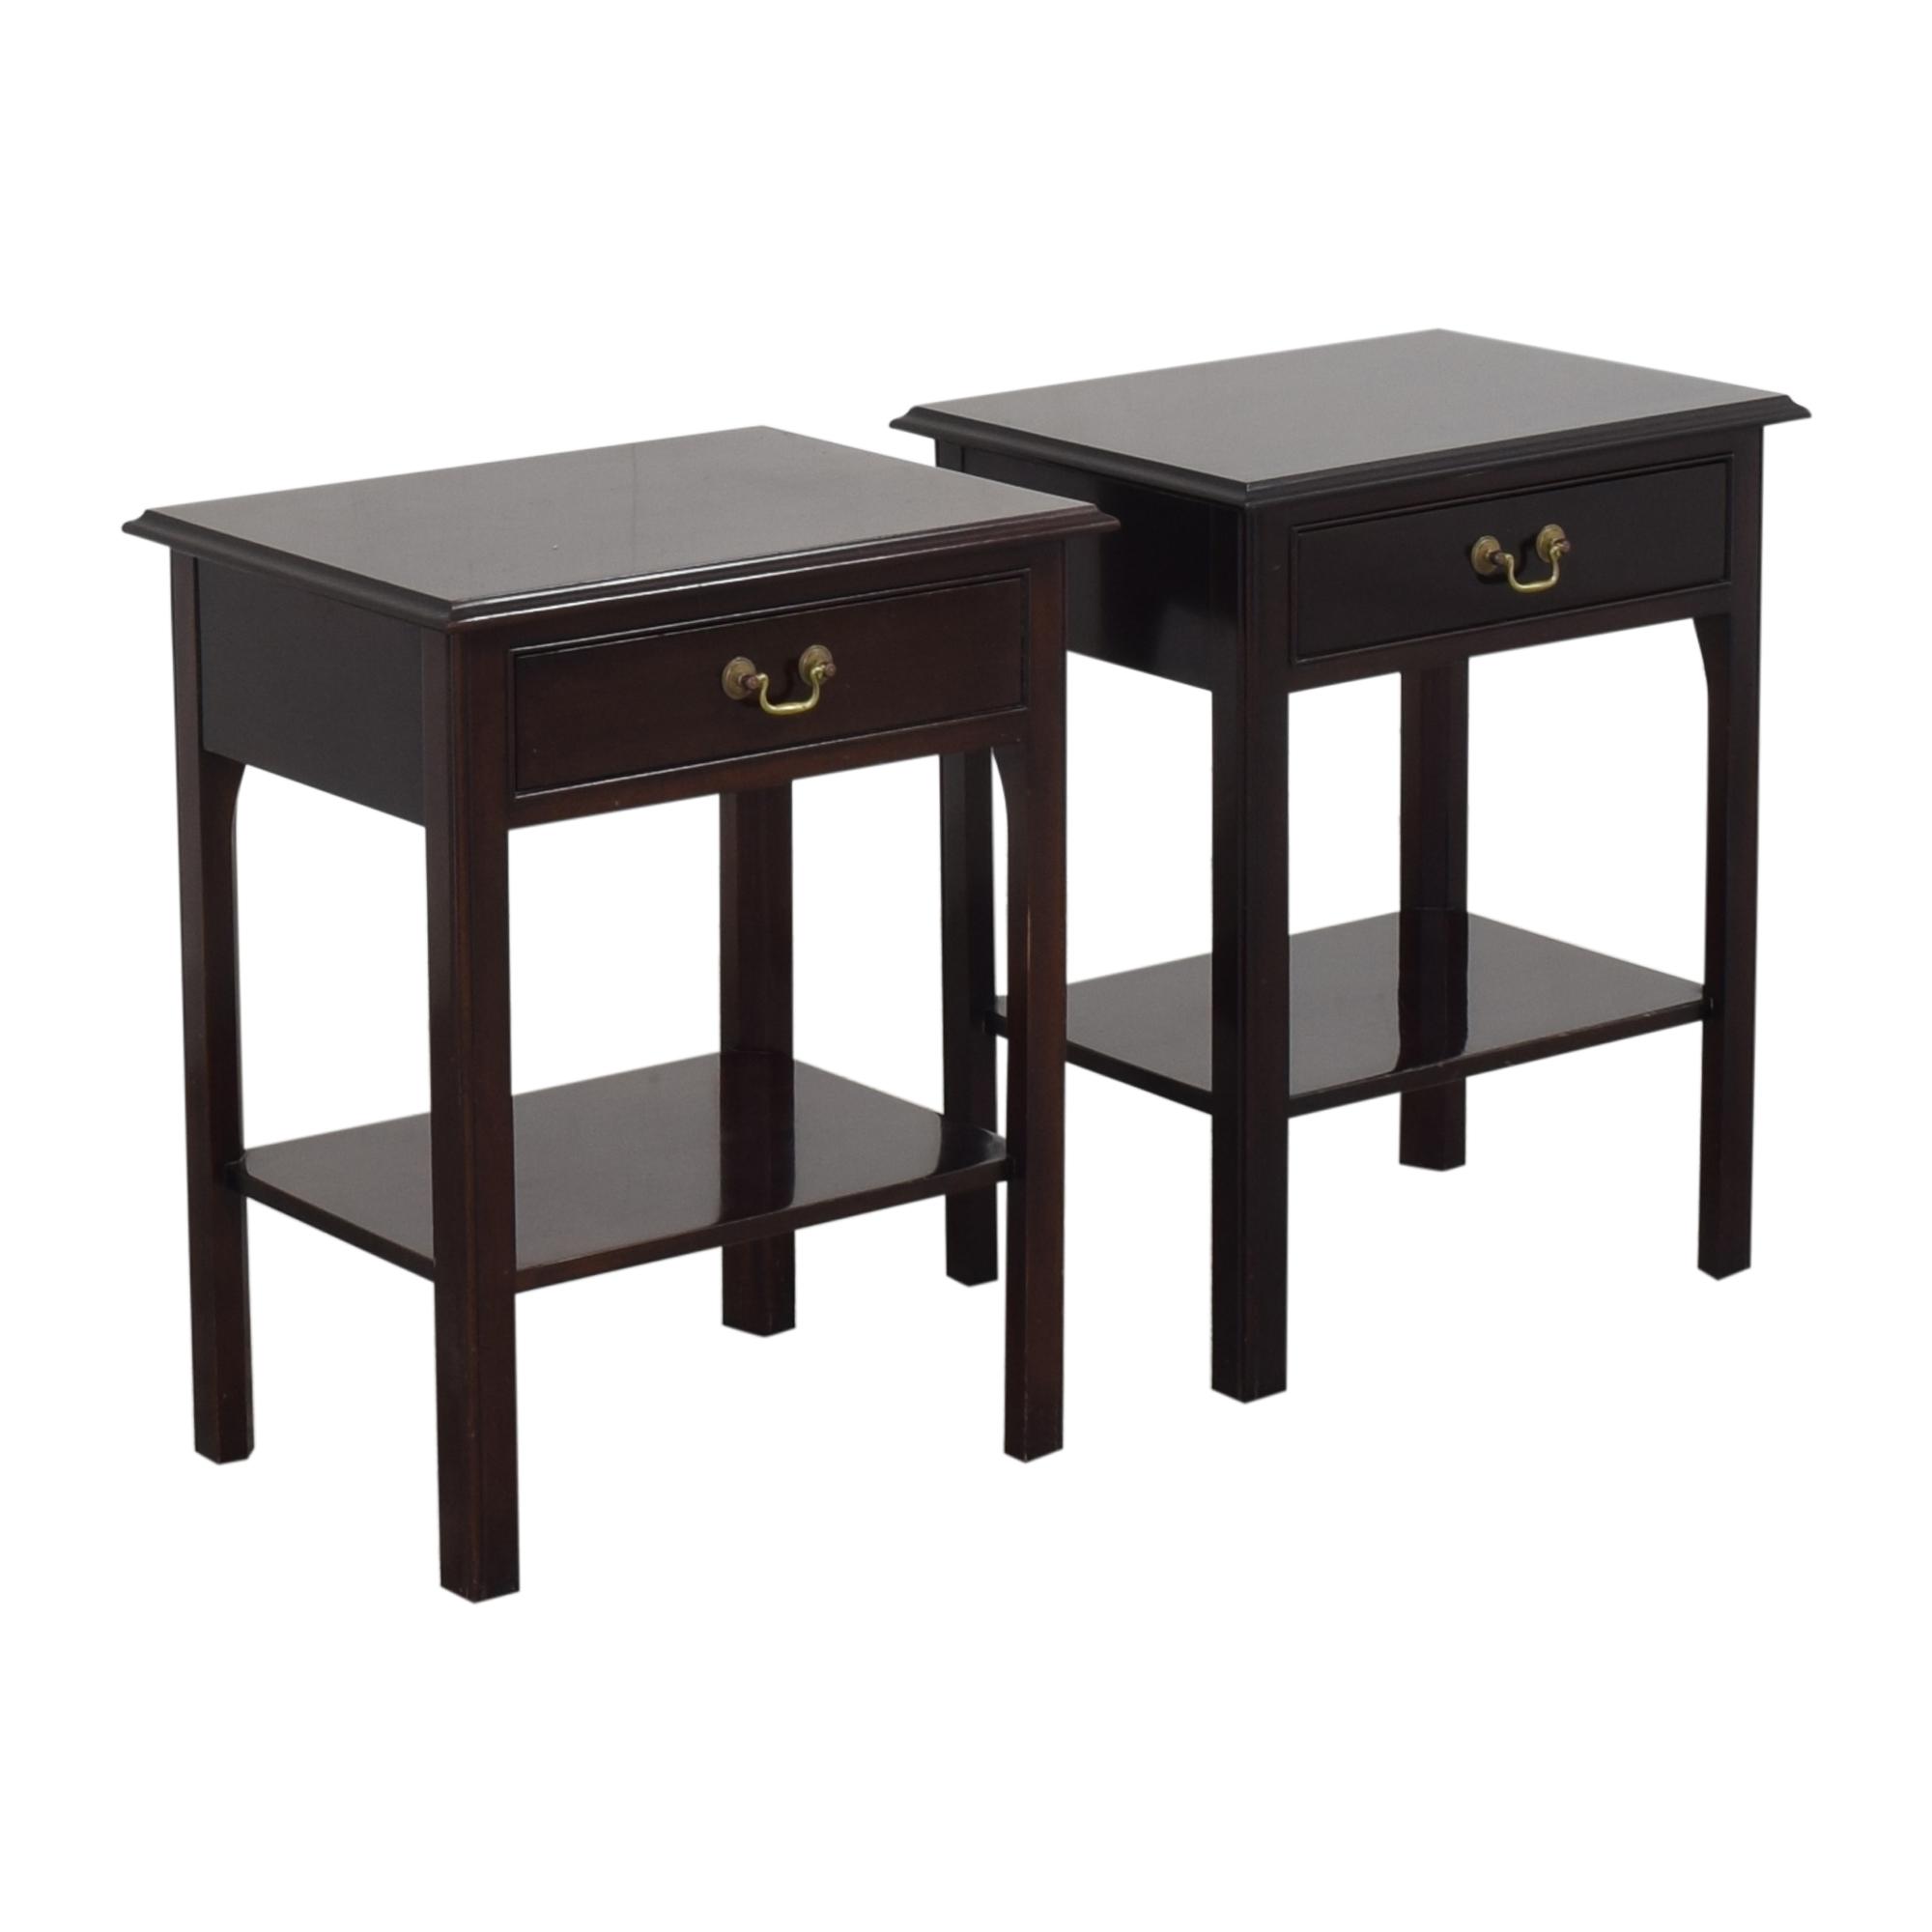 buy Stickley Furniture Nightstands Stickley Furniture